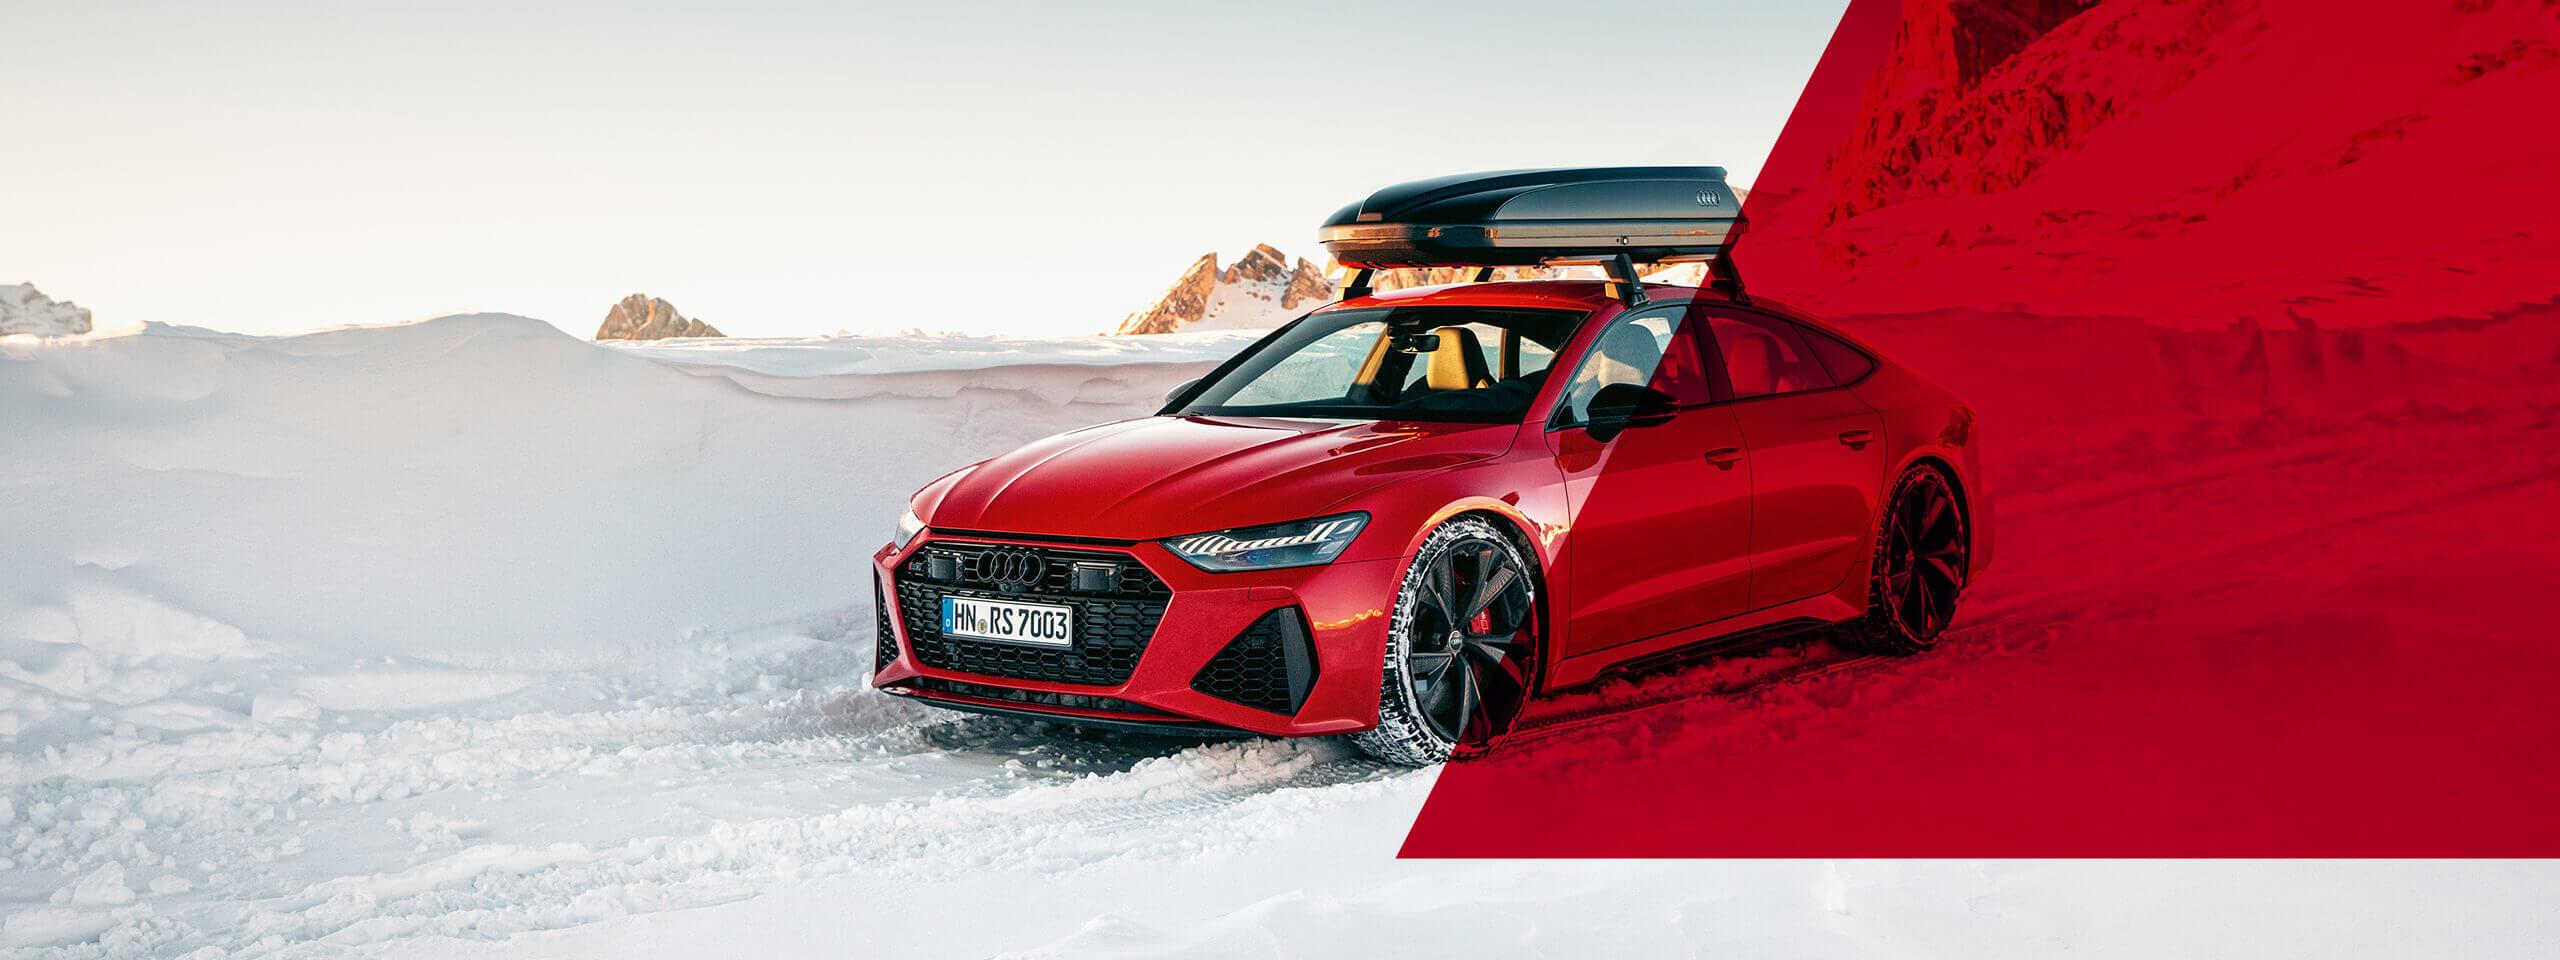 Audi Kalender 2021 Teaserbild